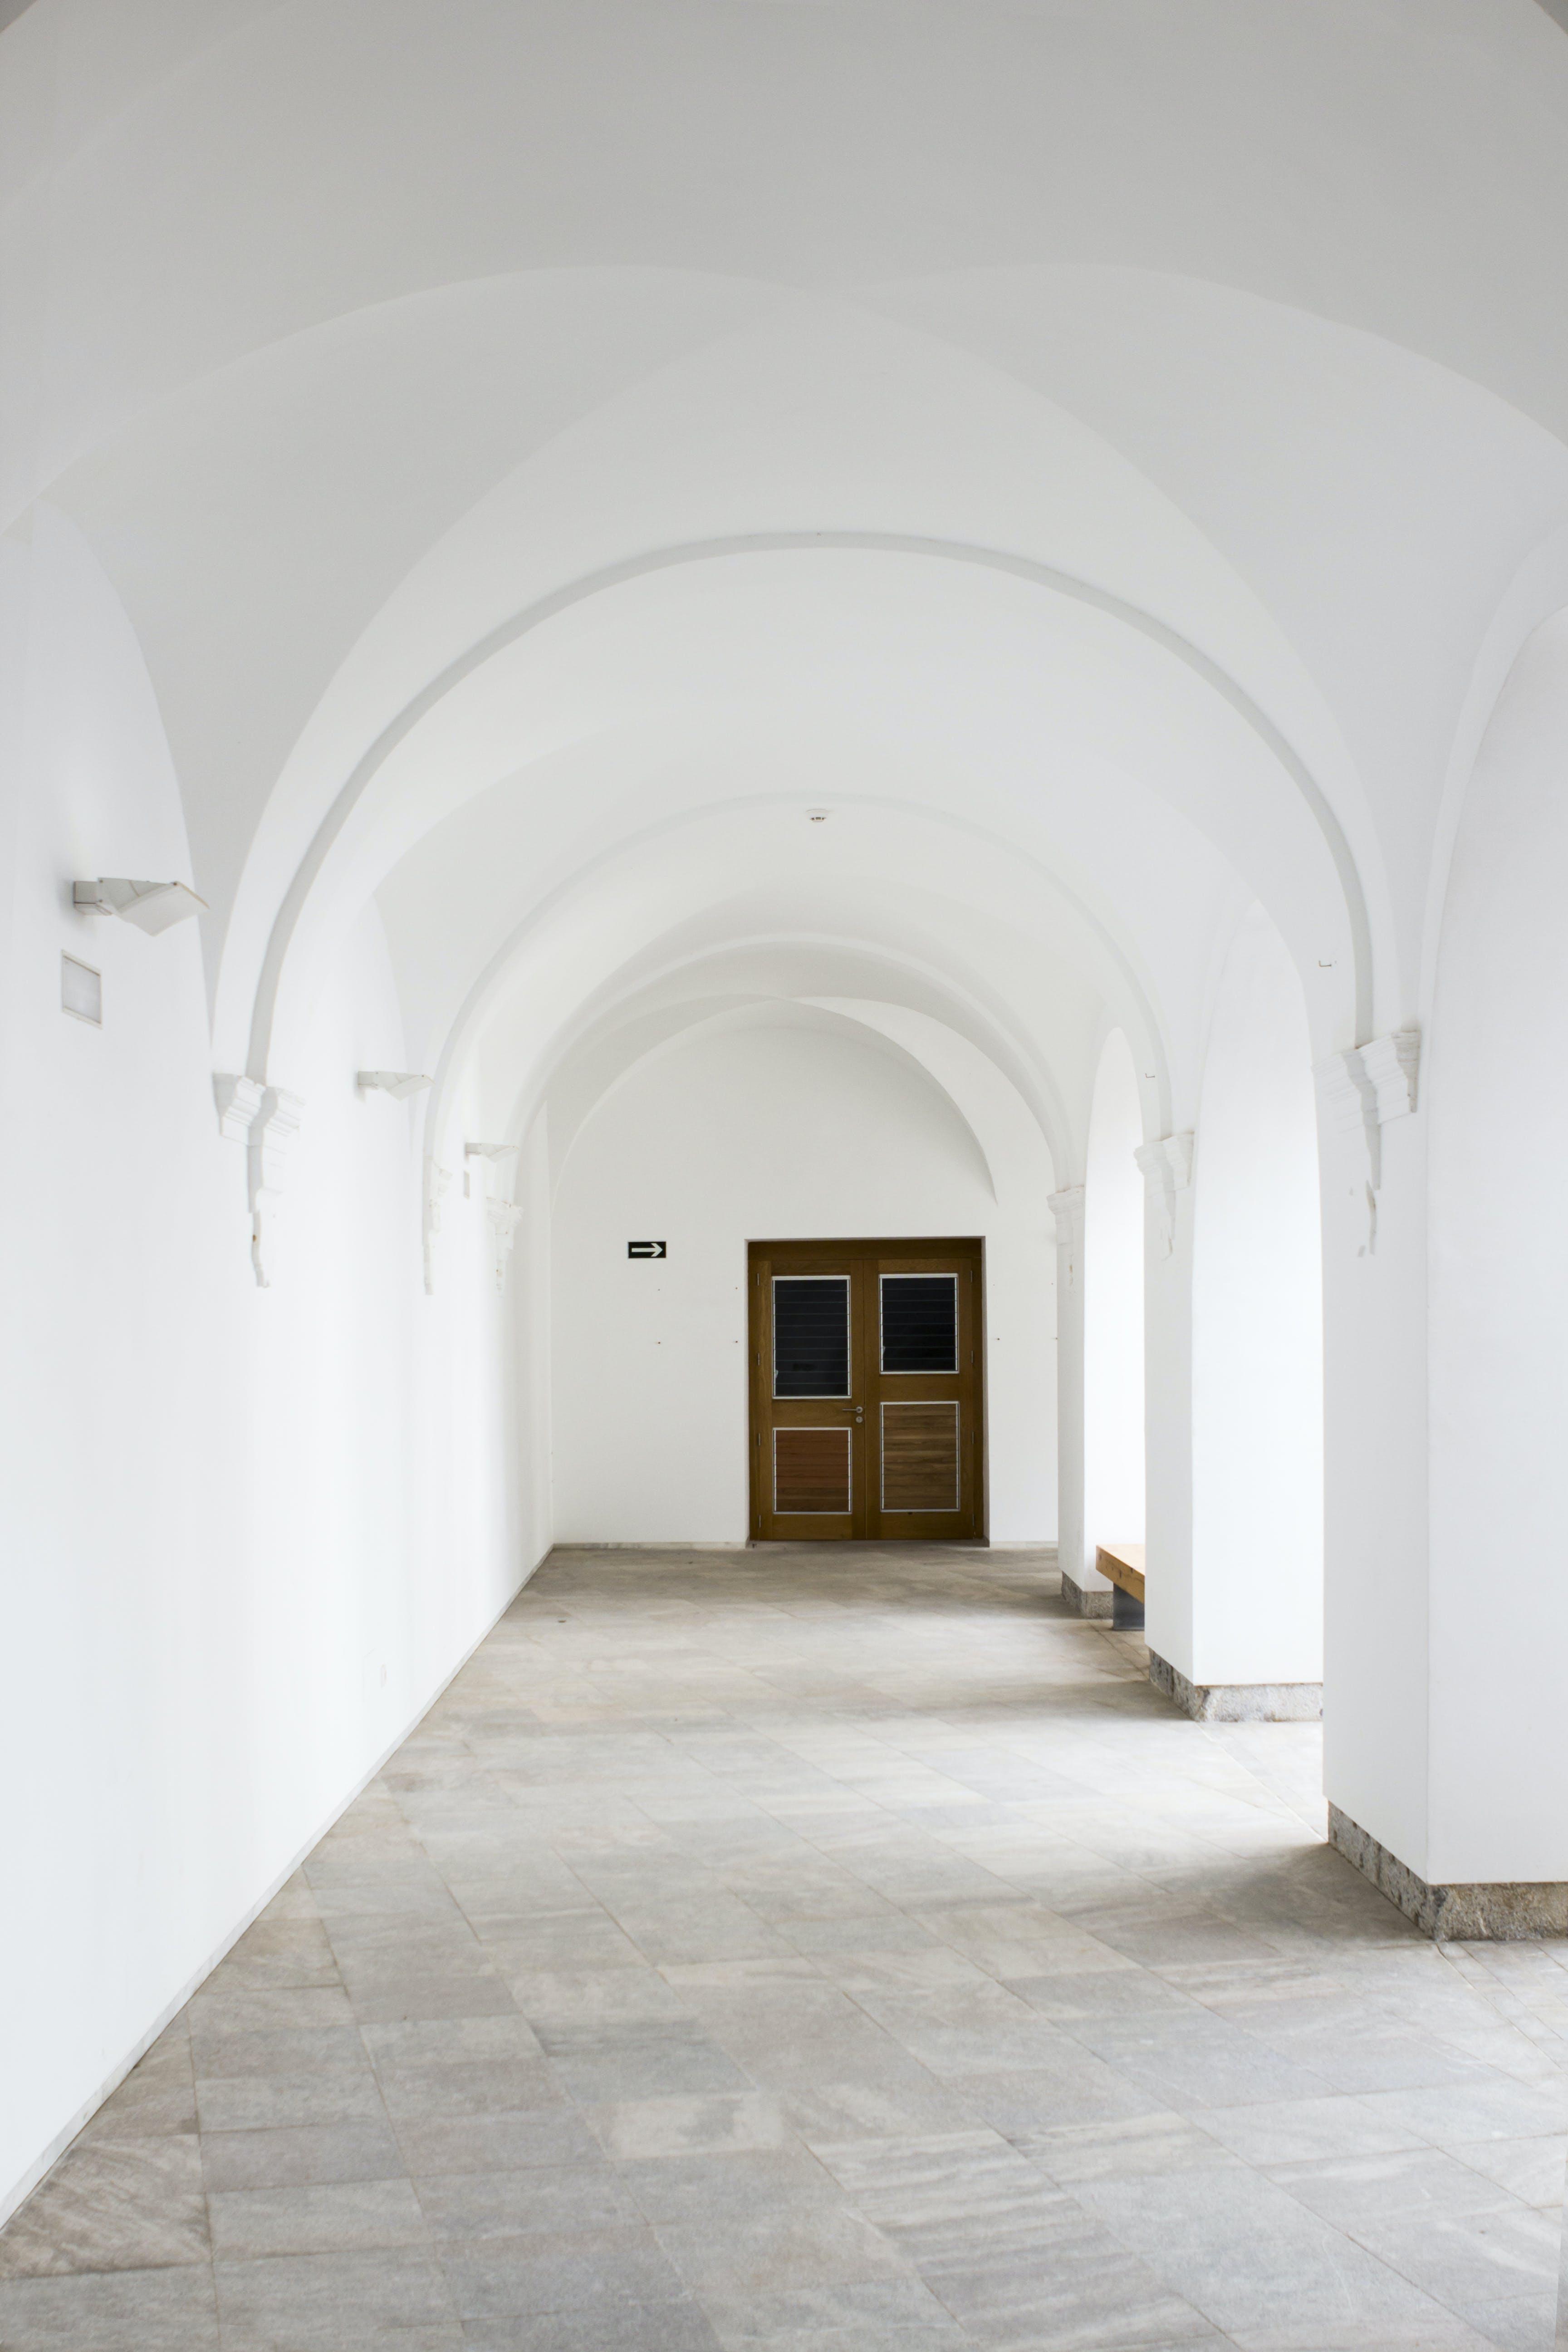 Gratis arkivbilde med arkitektur, buer, bygning, dagslys